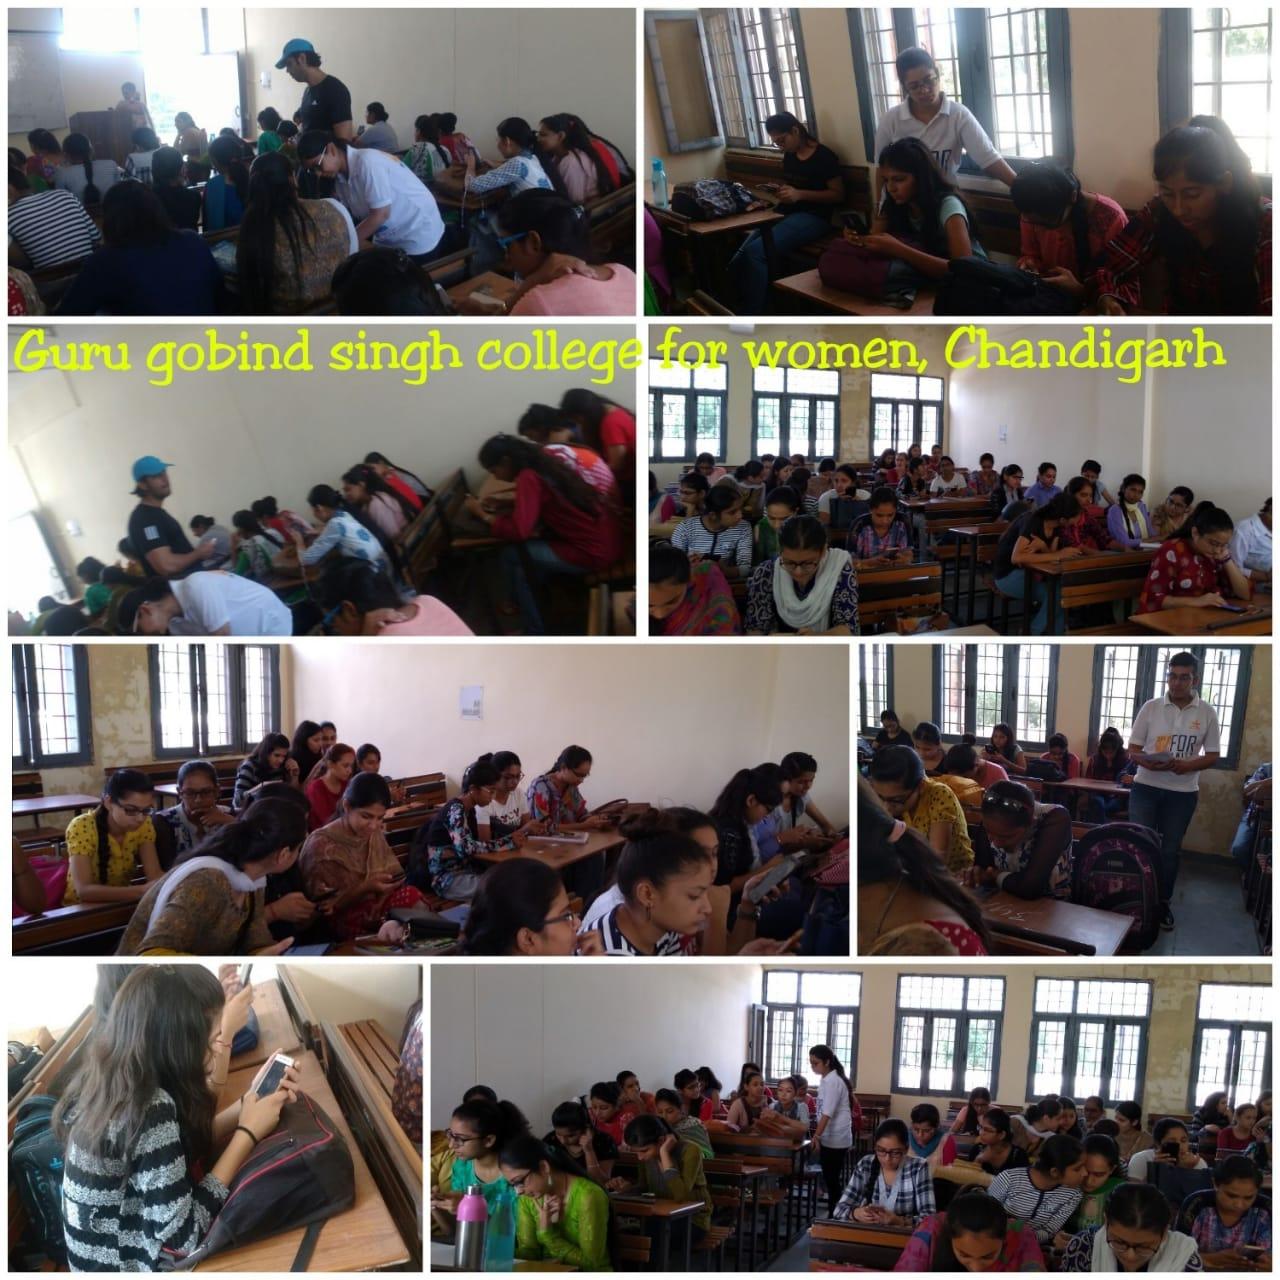 Guru gobind singh college for women Chandigarh.jpeg